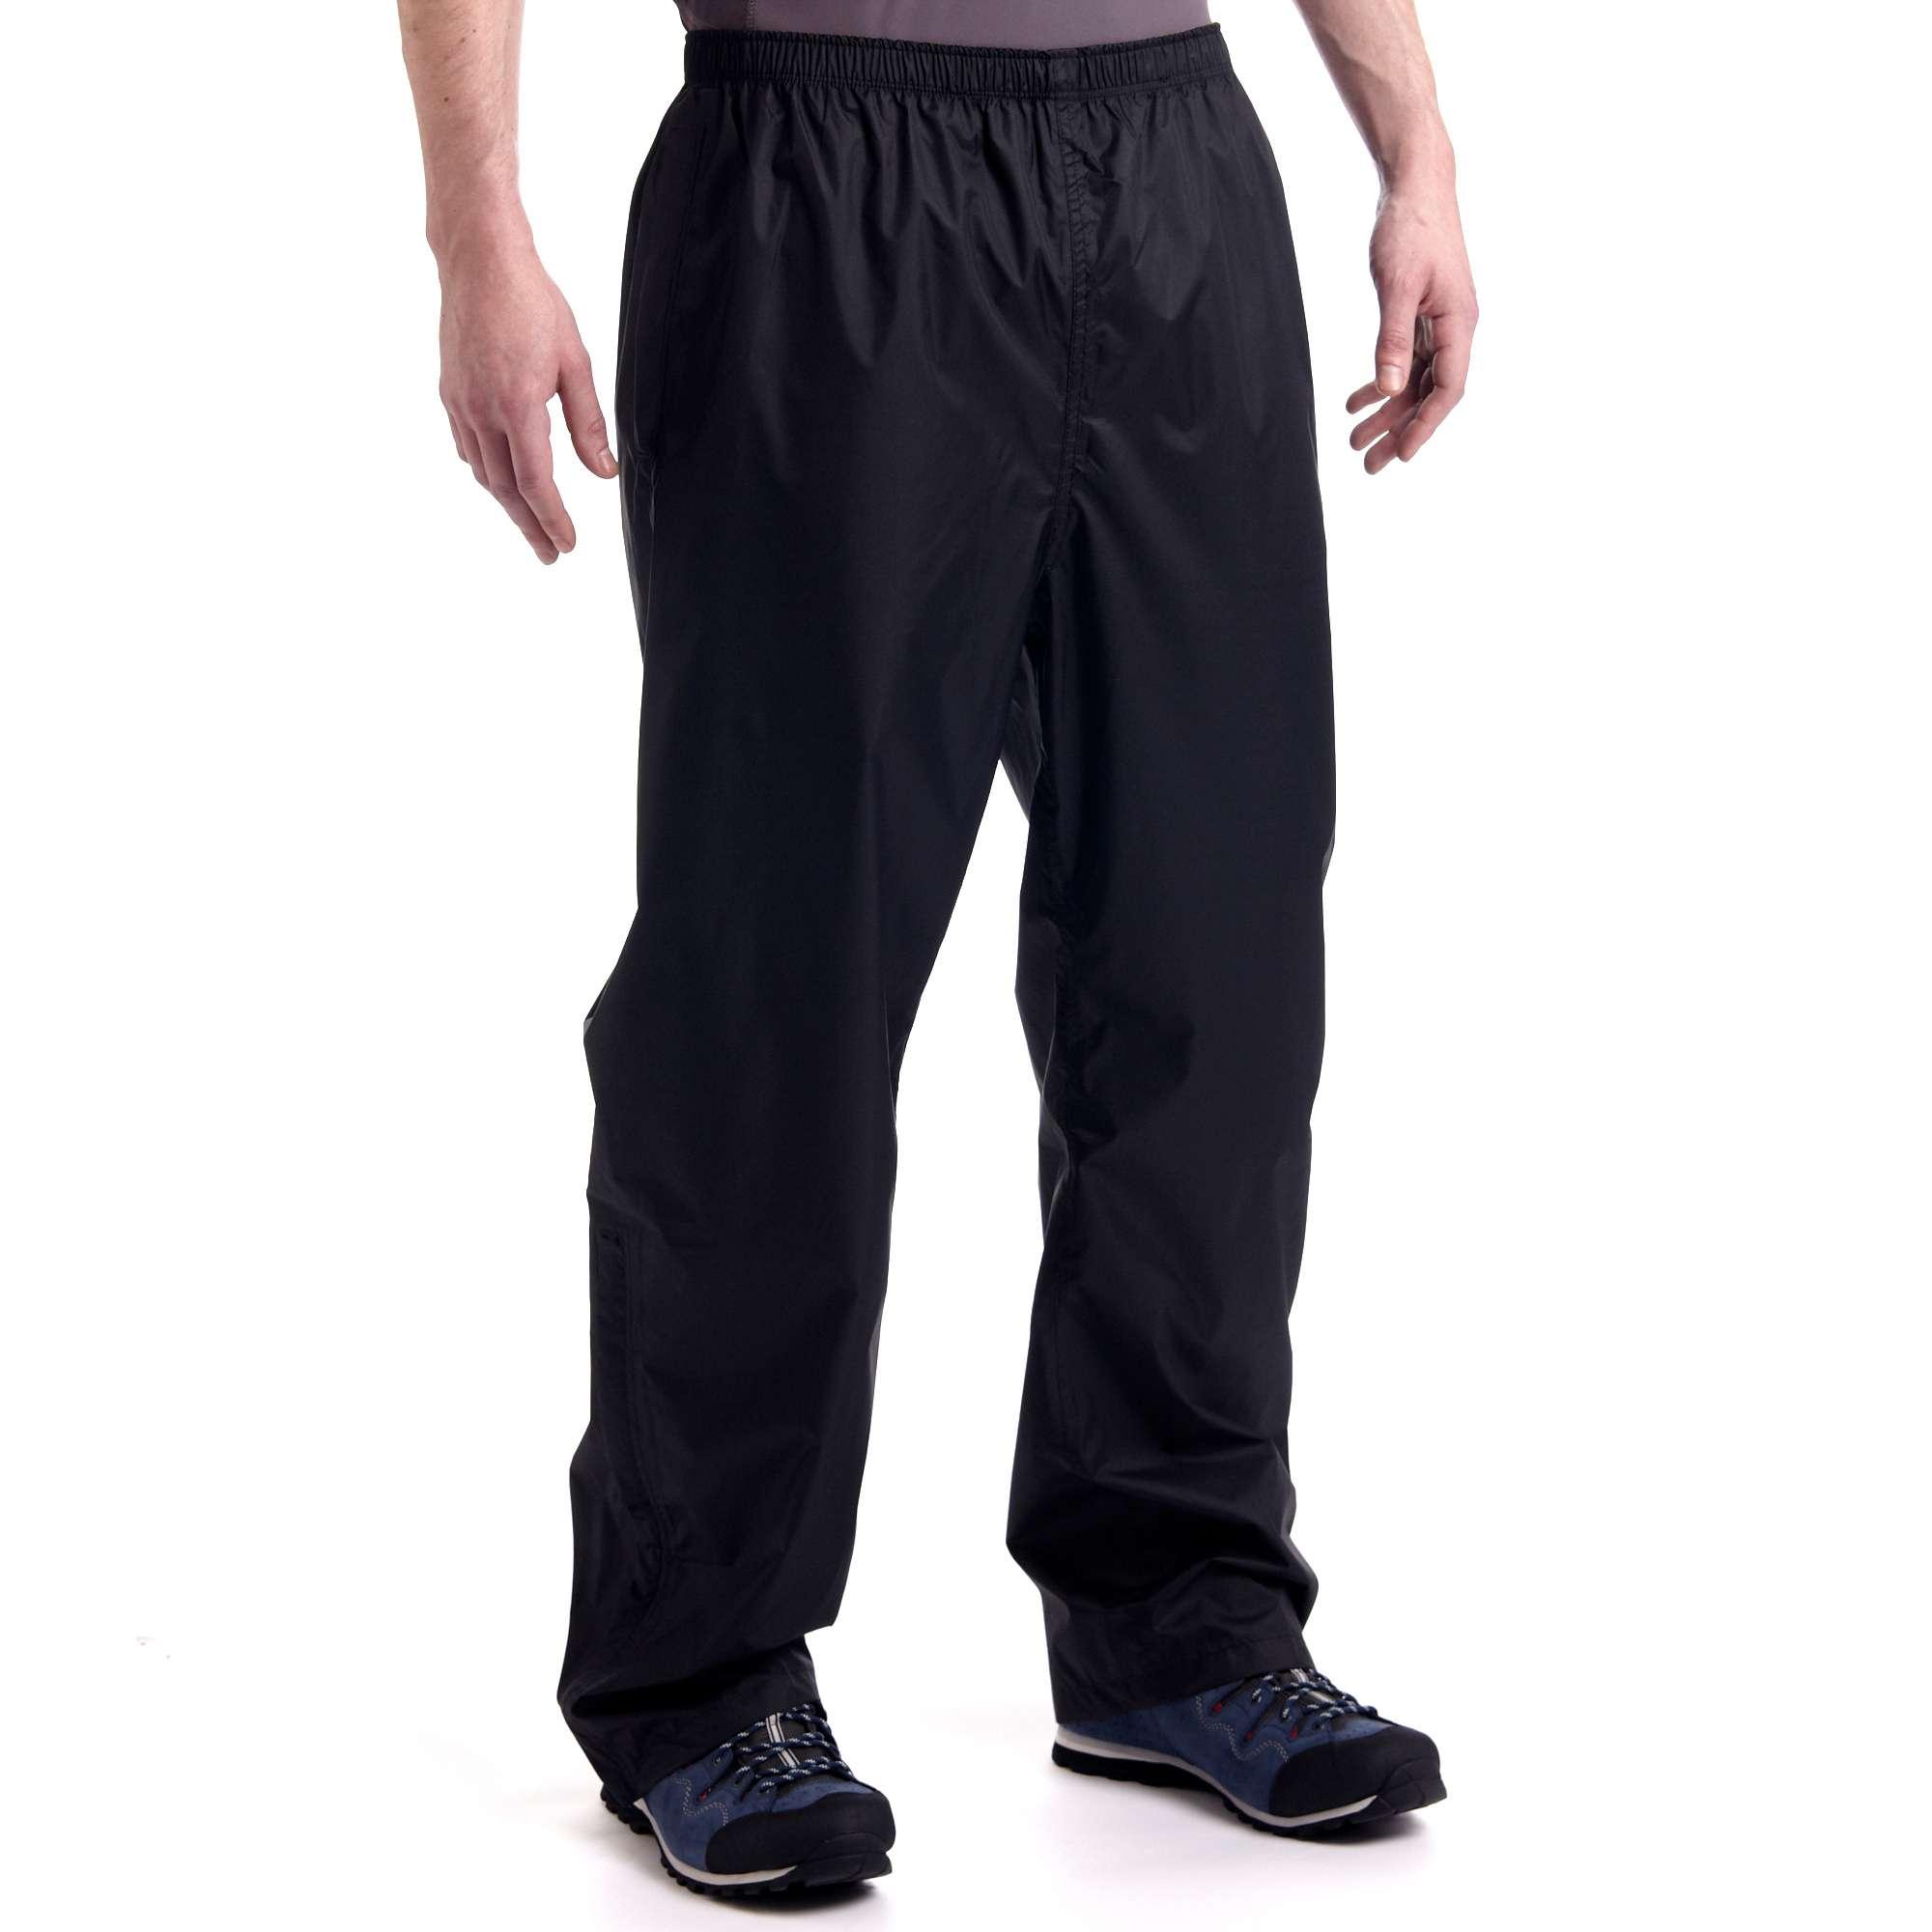 PETER STORM Men's Torrential Waterproof Trousers